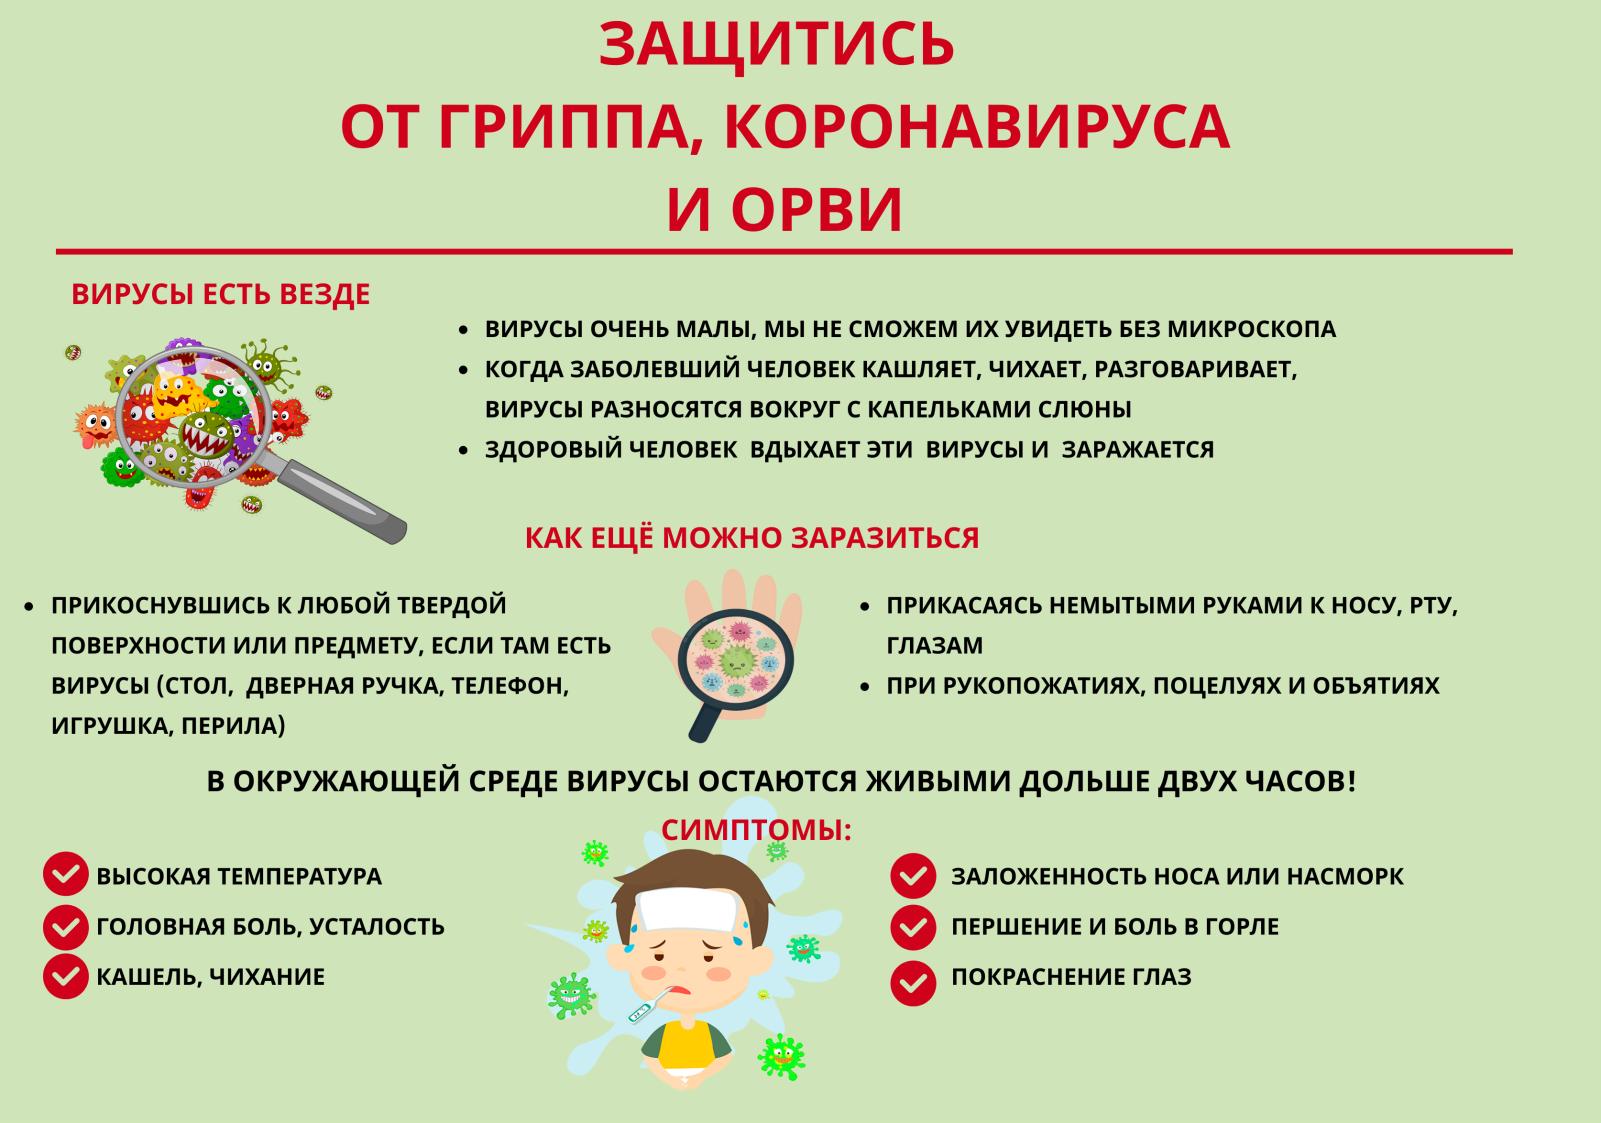 http://25.rospotrebnadzor.ru/image/image_gallery?uuid=740f4b8a-0a1f-45dd-8086-a6540d4ef6d3&groupId=10156&t=1580701188653